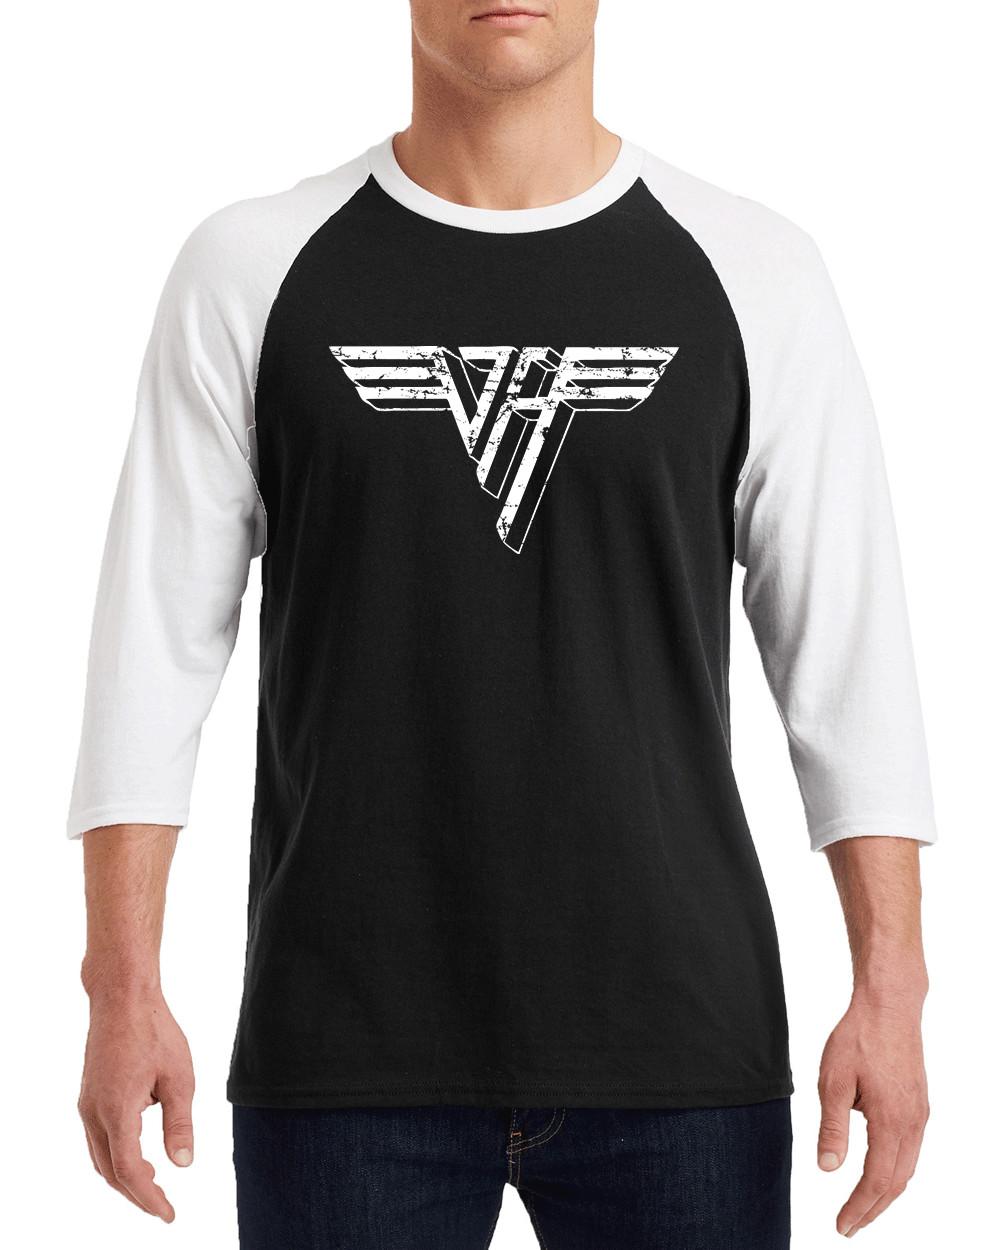 VAN HALEN II WHITE Distress Logo Gildan G570 3/4 Sleeve Shirt